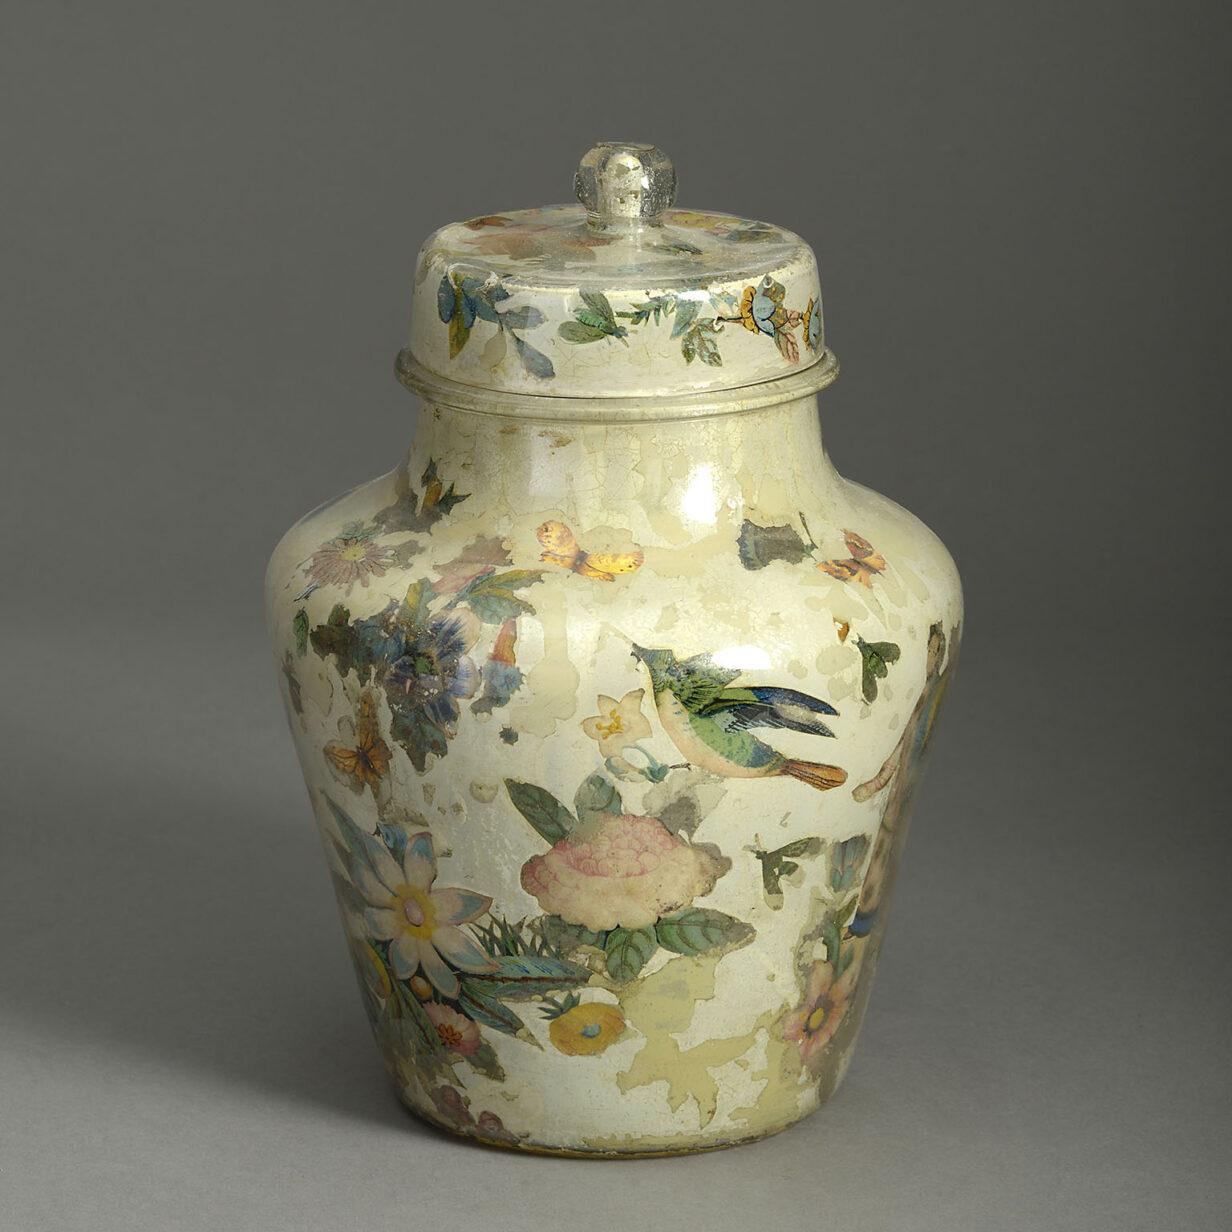 Small Lidded Decalcomania Vase